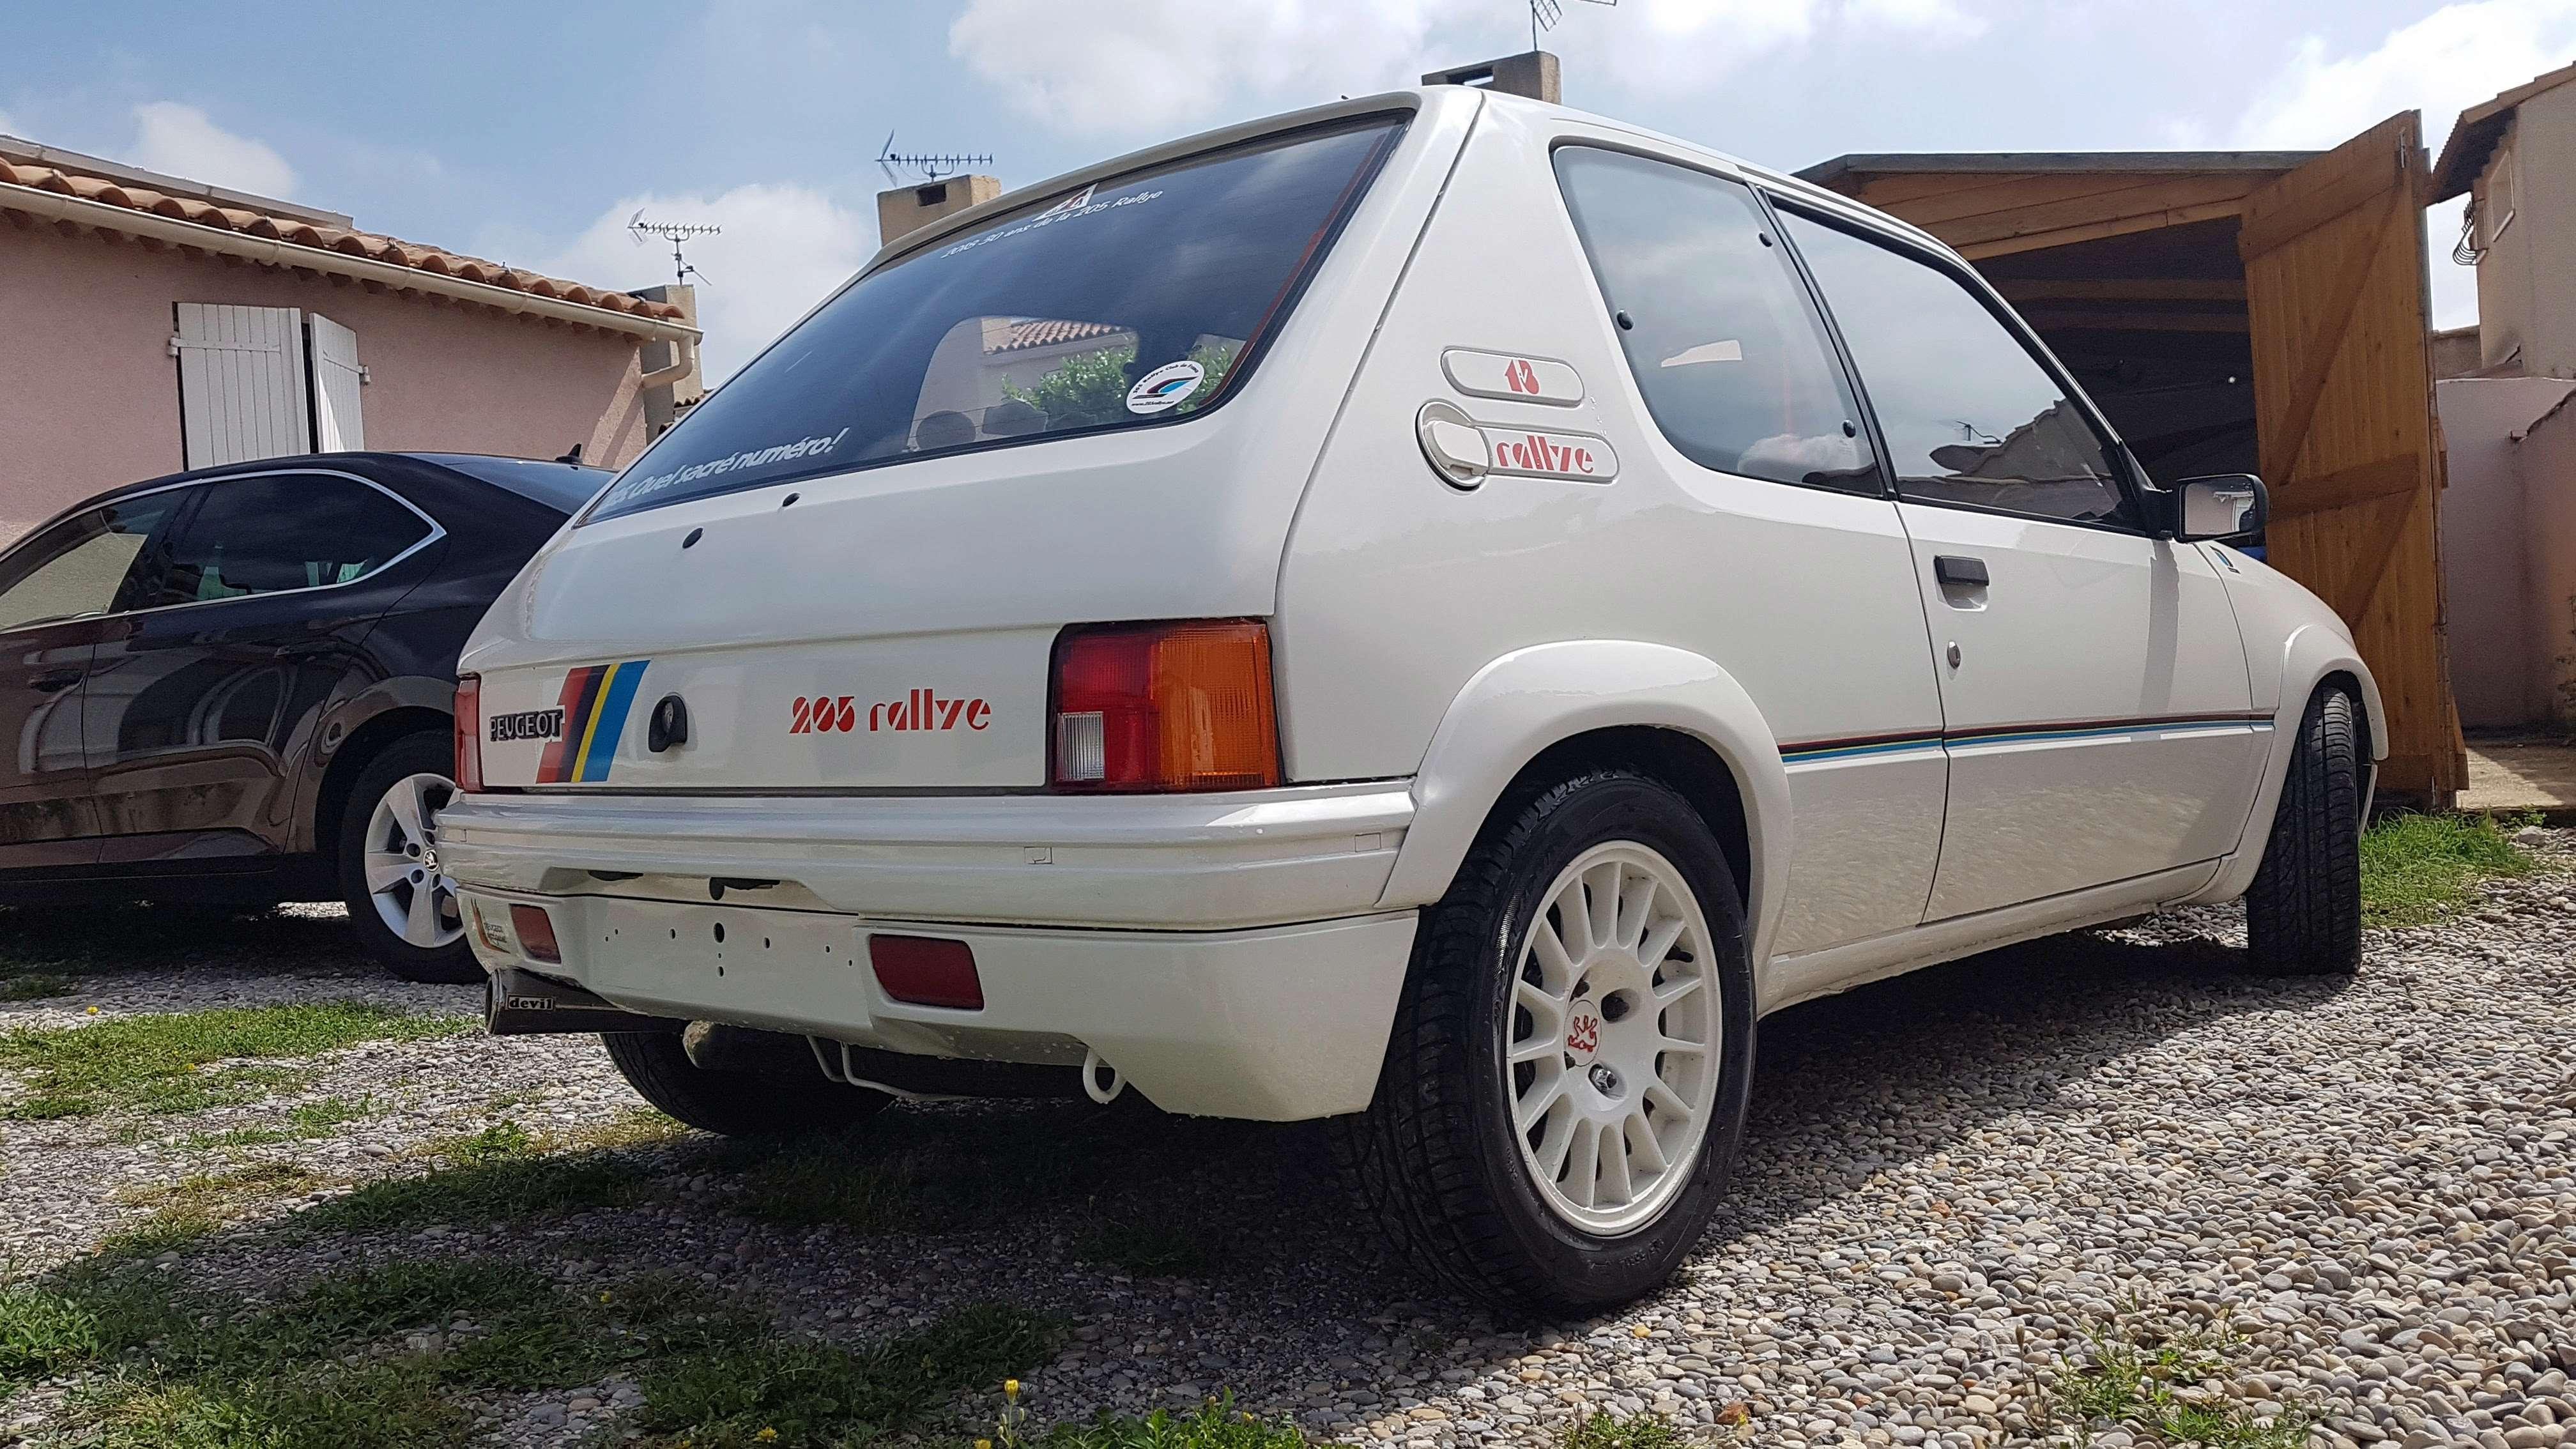 [jean-luc13] 205 Rallye Blanc Meije 1989 - Page 23 20180611